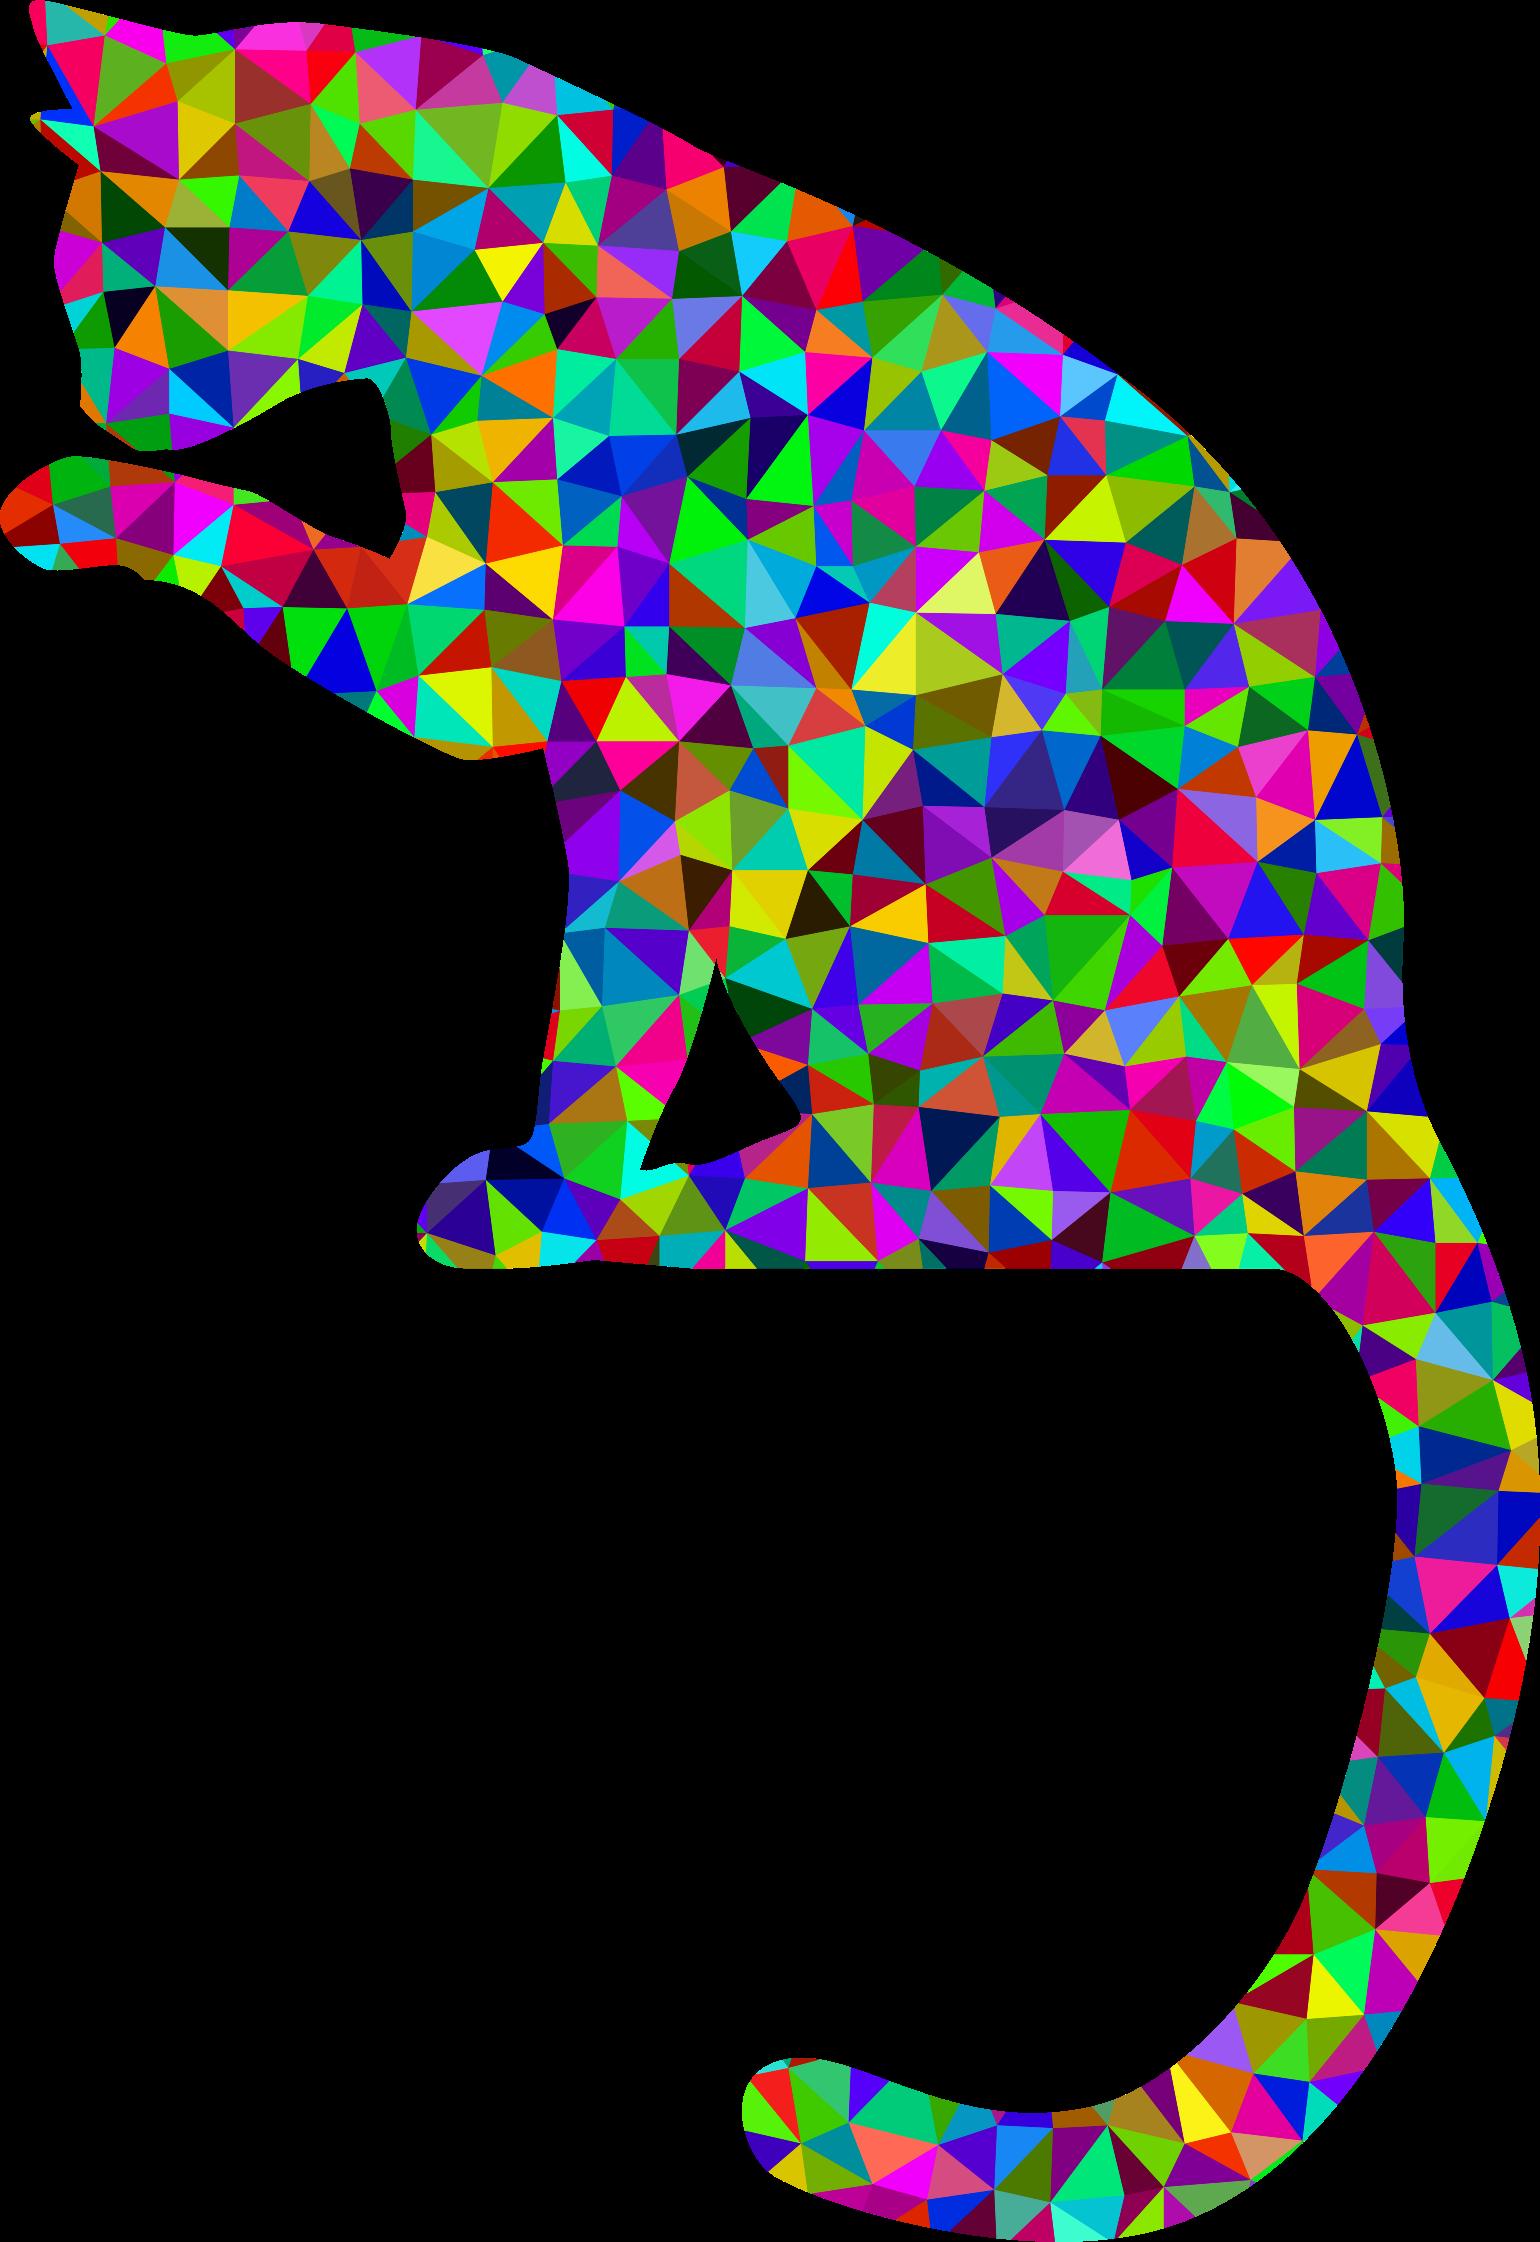 Rainbow cat clipart jpg transparent Clipart - Prismatic Low Poly Cat jpg transparent